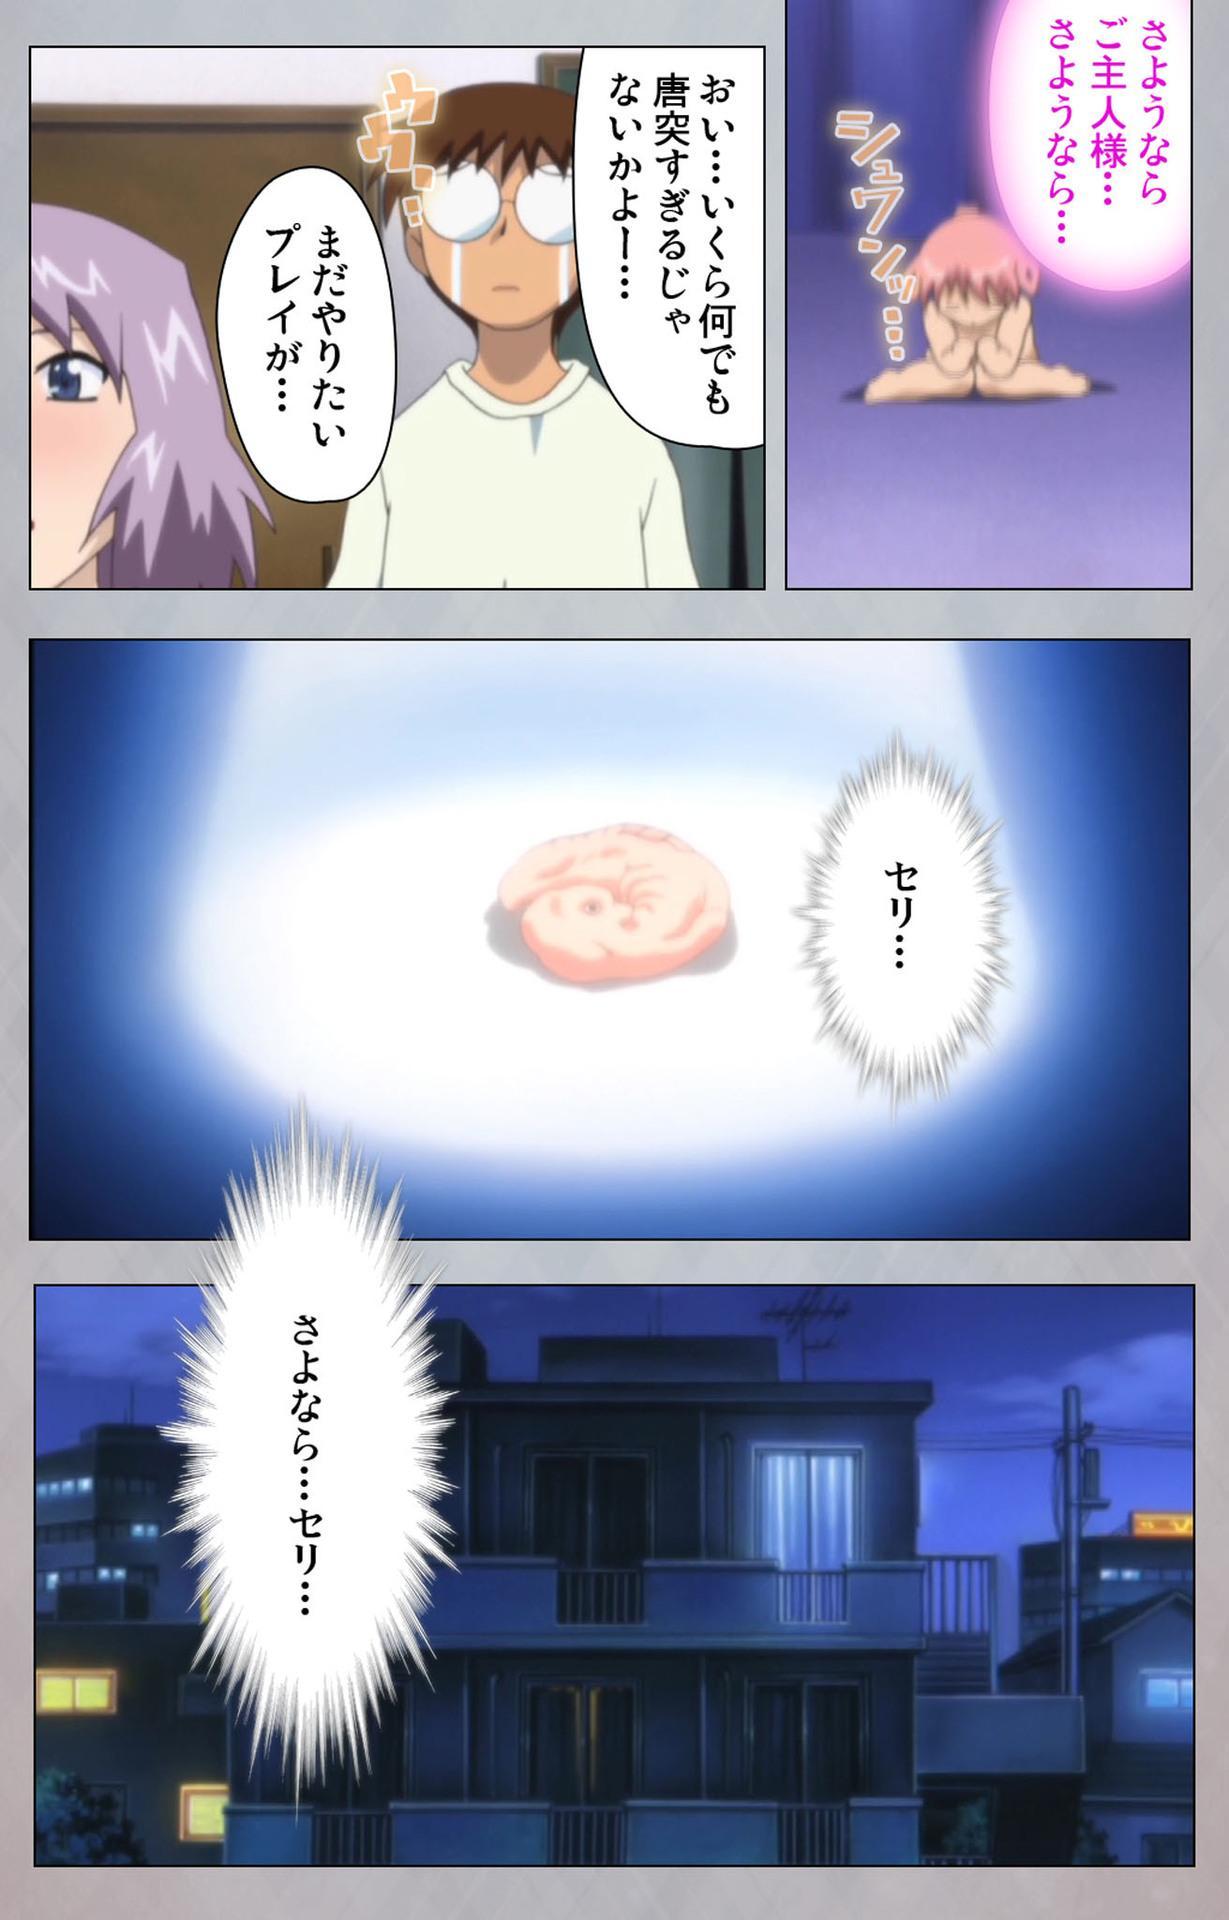 [Digital Works] [Full Color Seijin Ban] Sex Android ~Risou no Onna de Nuite yaru~ Kanzenban 240